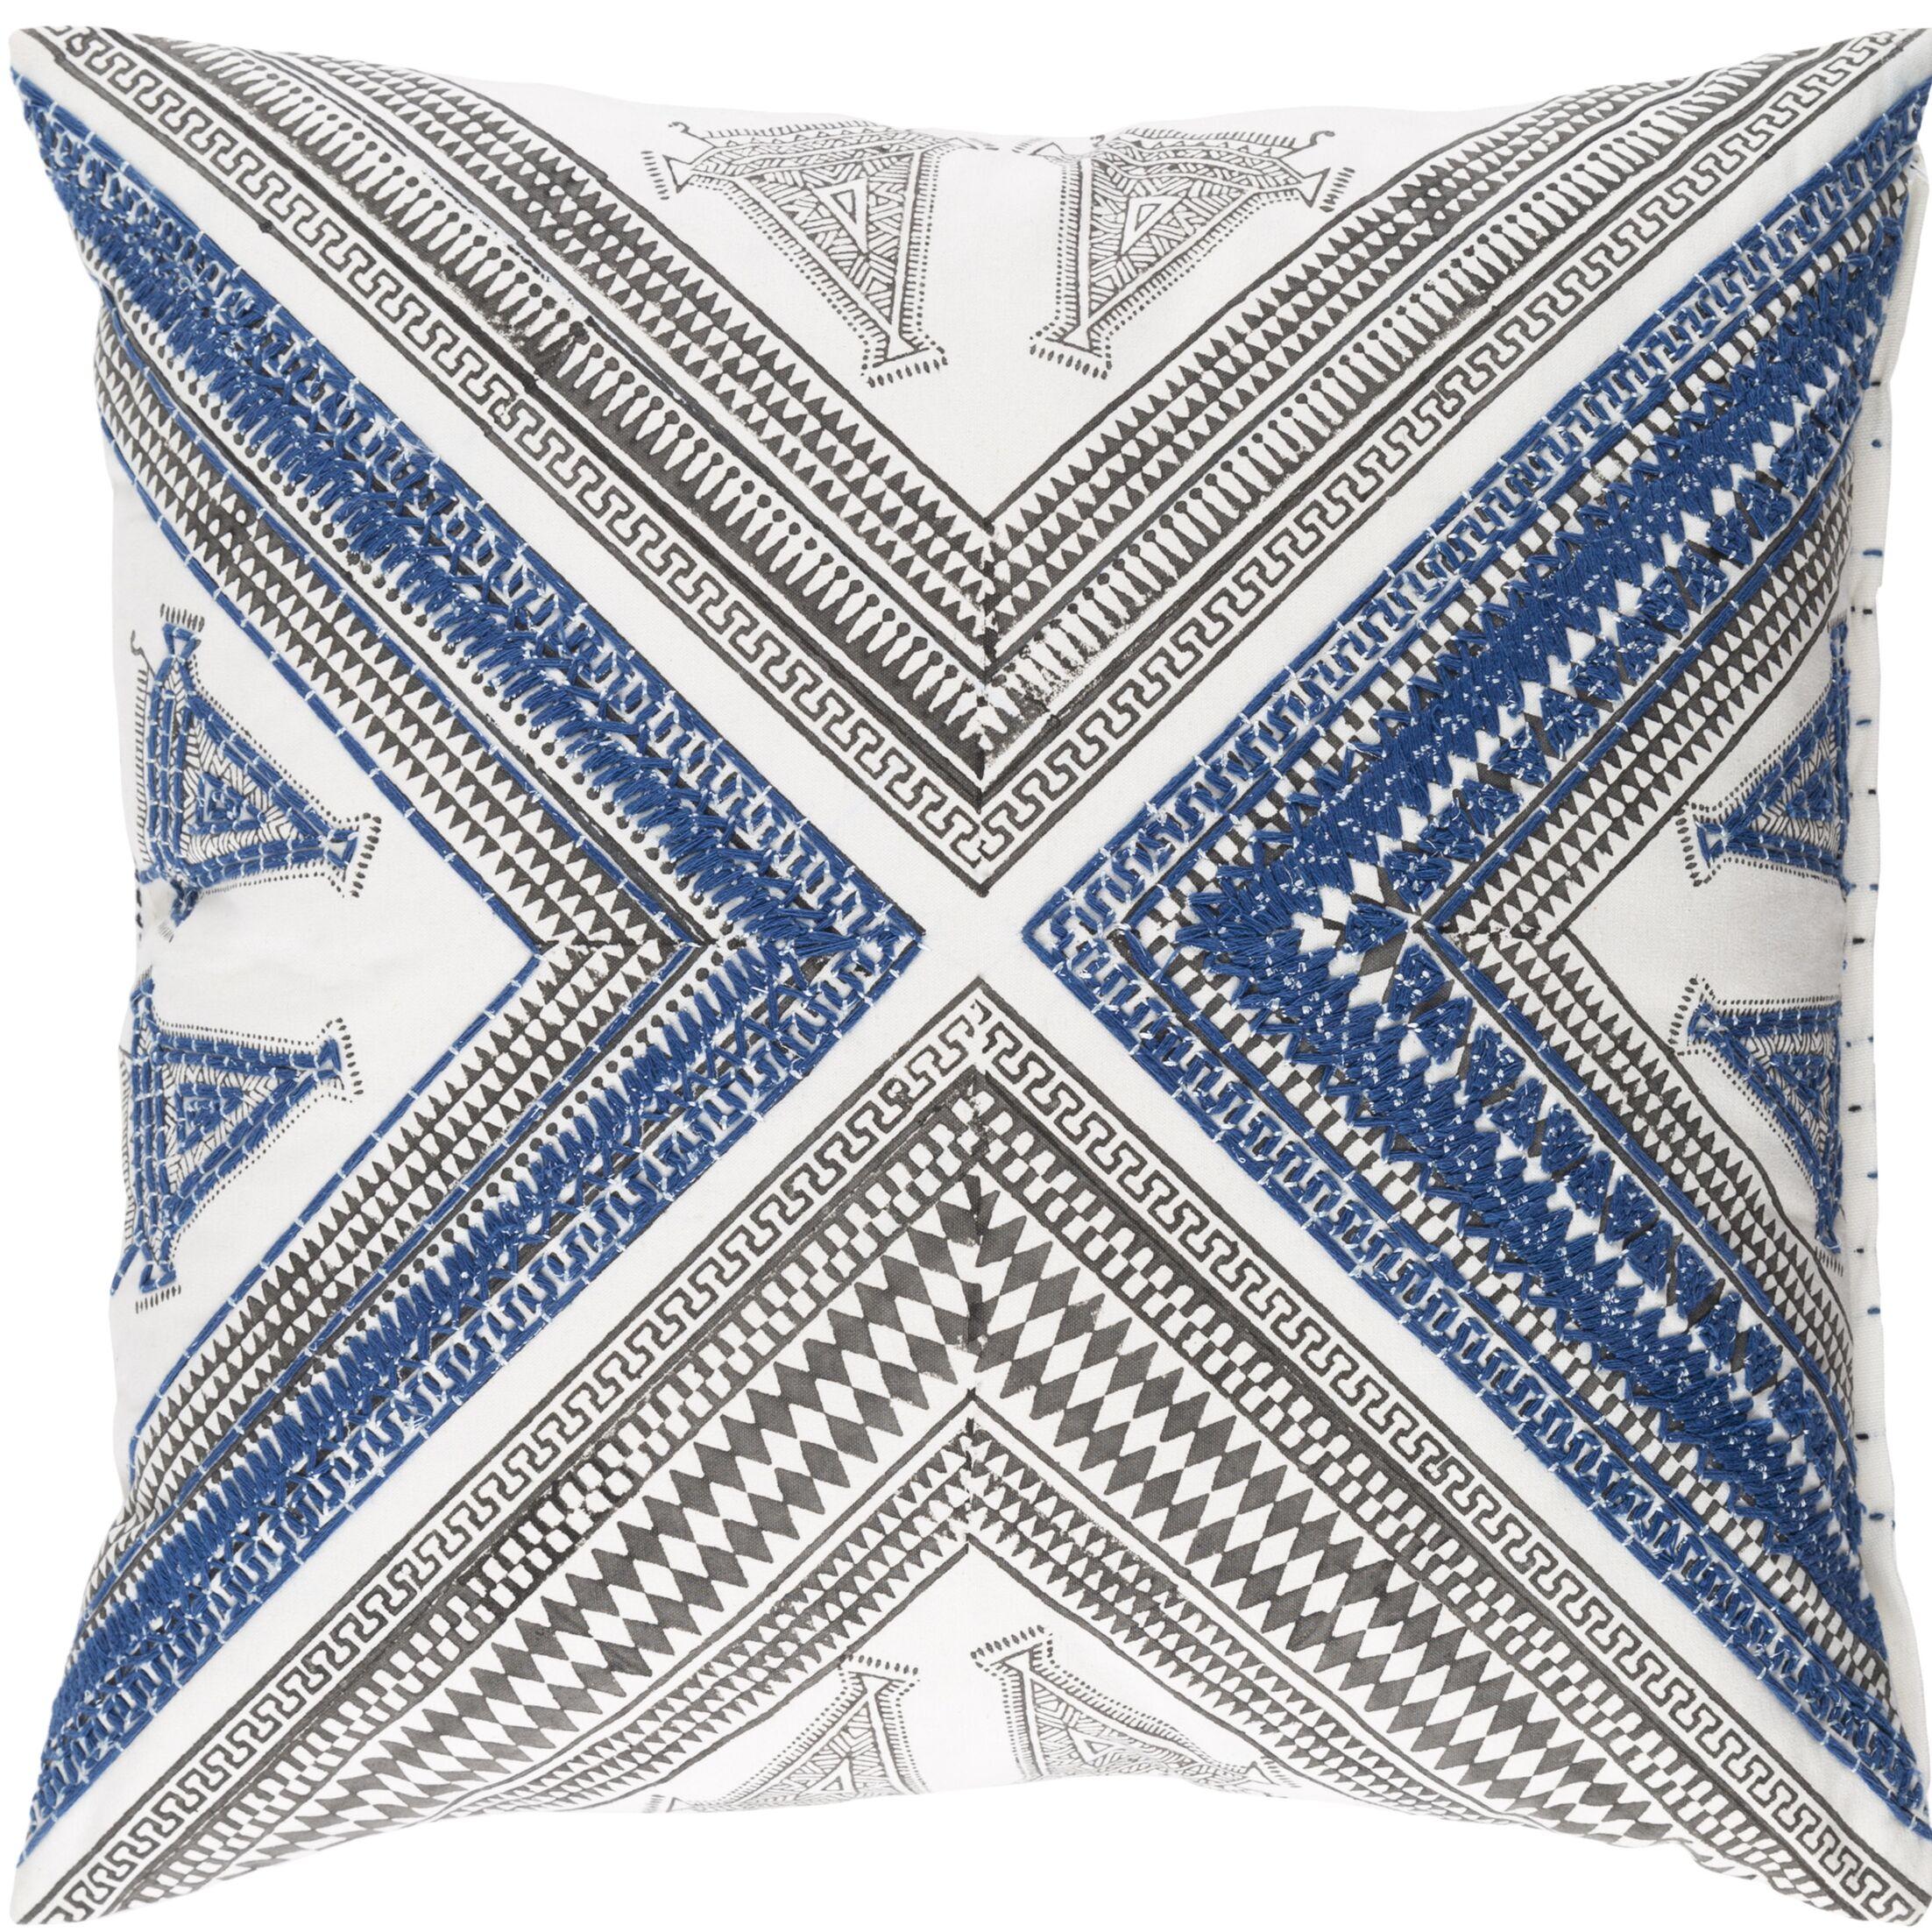 Amorita Throw Pillow Cover Size: 22